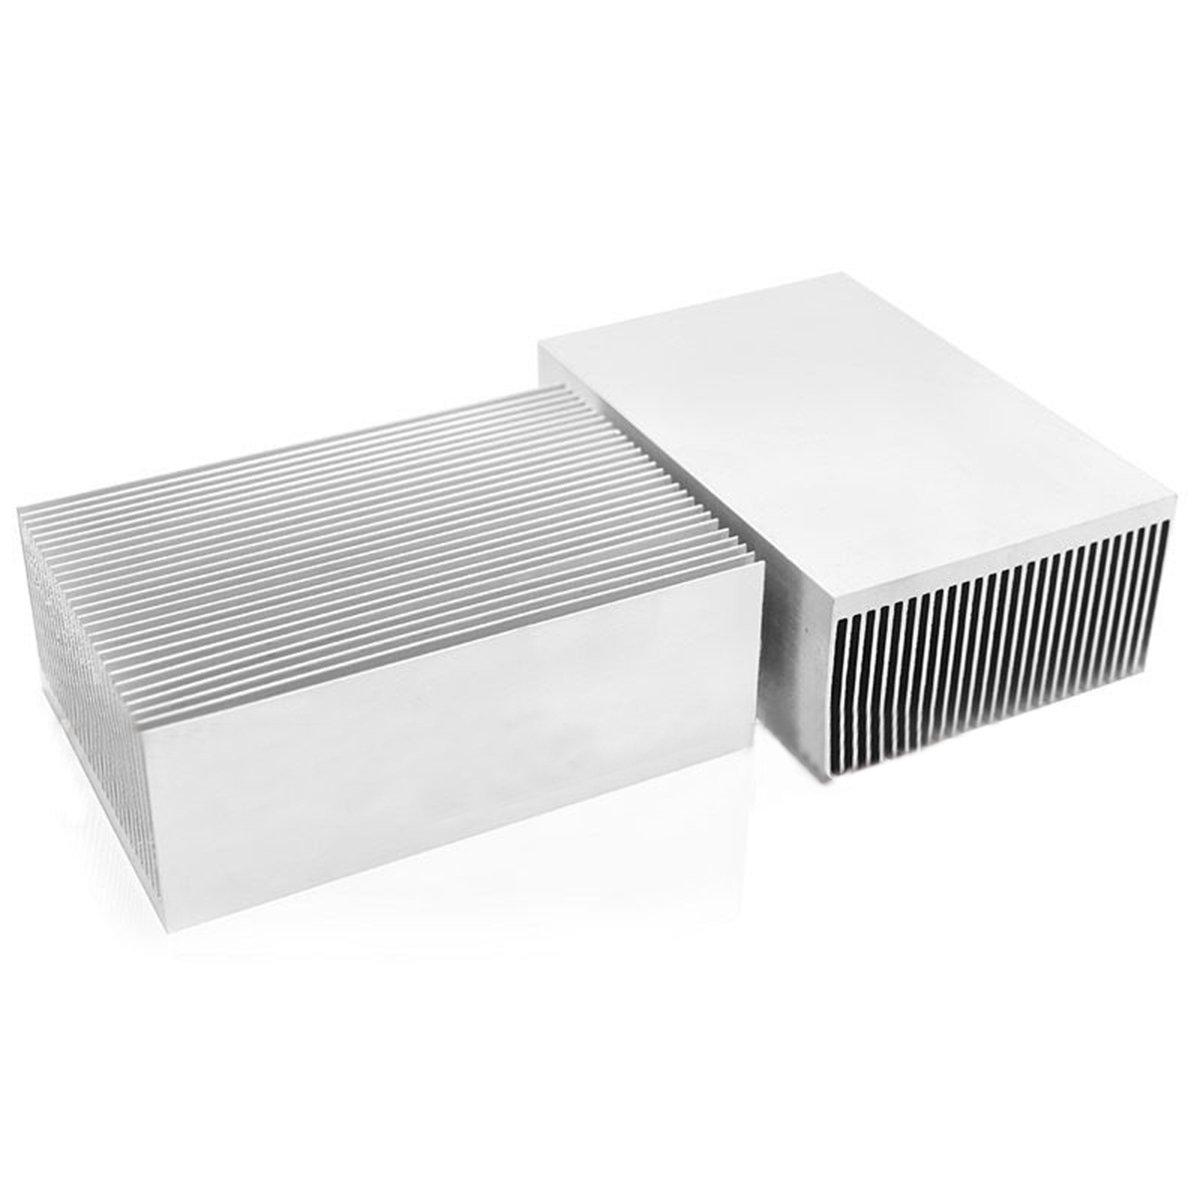 DWZ 1pc Large Big Aluminum Heatsink Heat Sink Radiator for Led High Power Amplifier